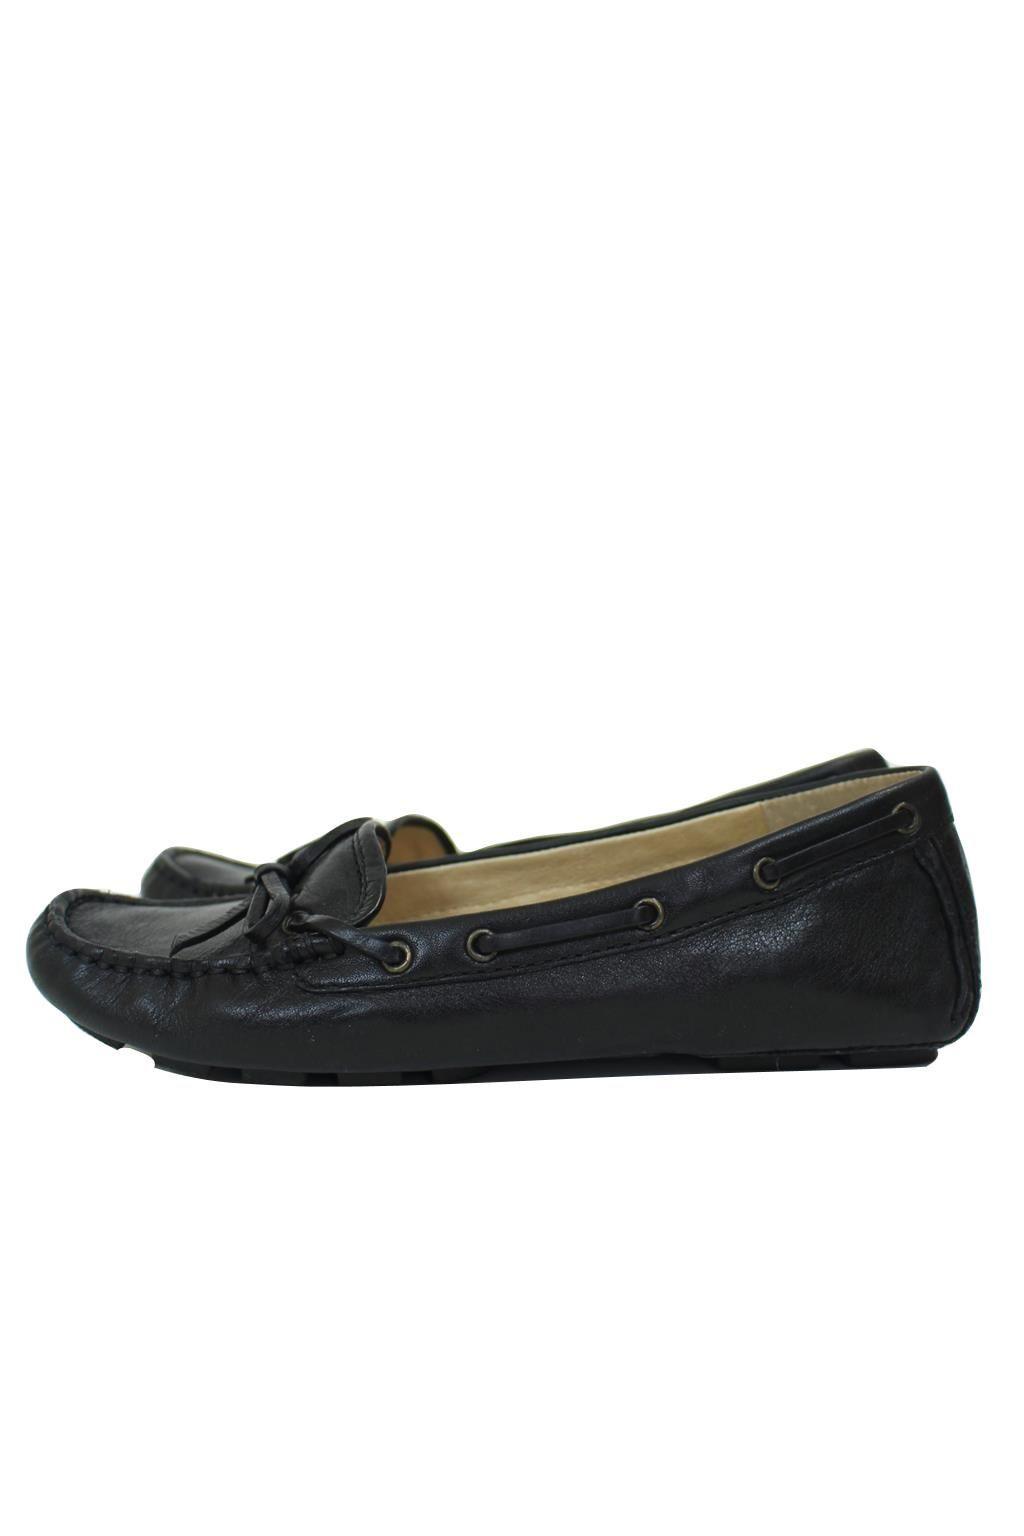 c2056b62788 Frye Reagan Campus Driving Mocs Shoes Black Size 7